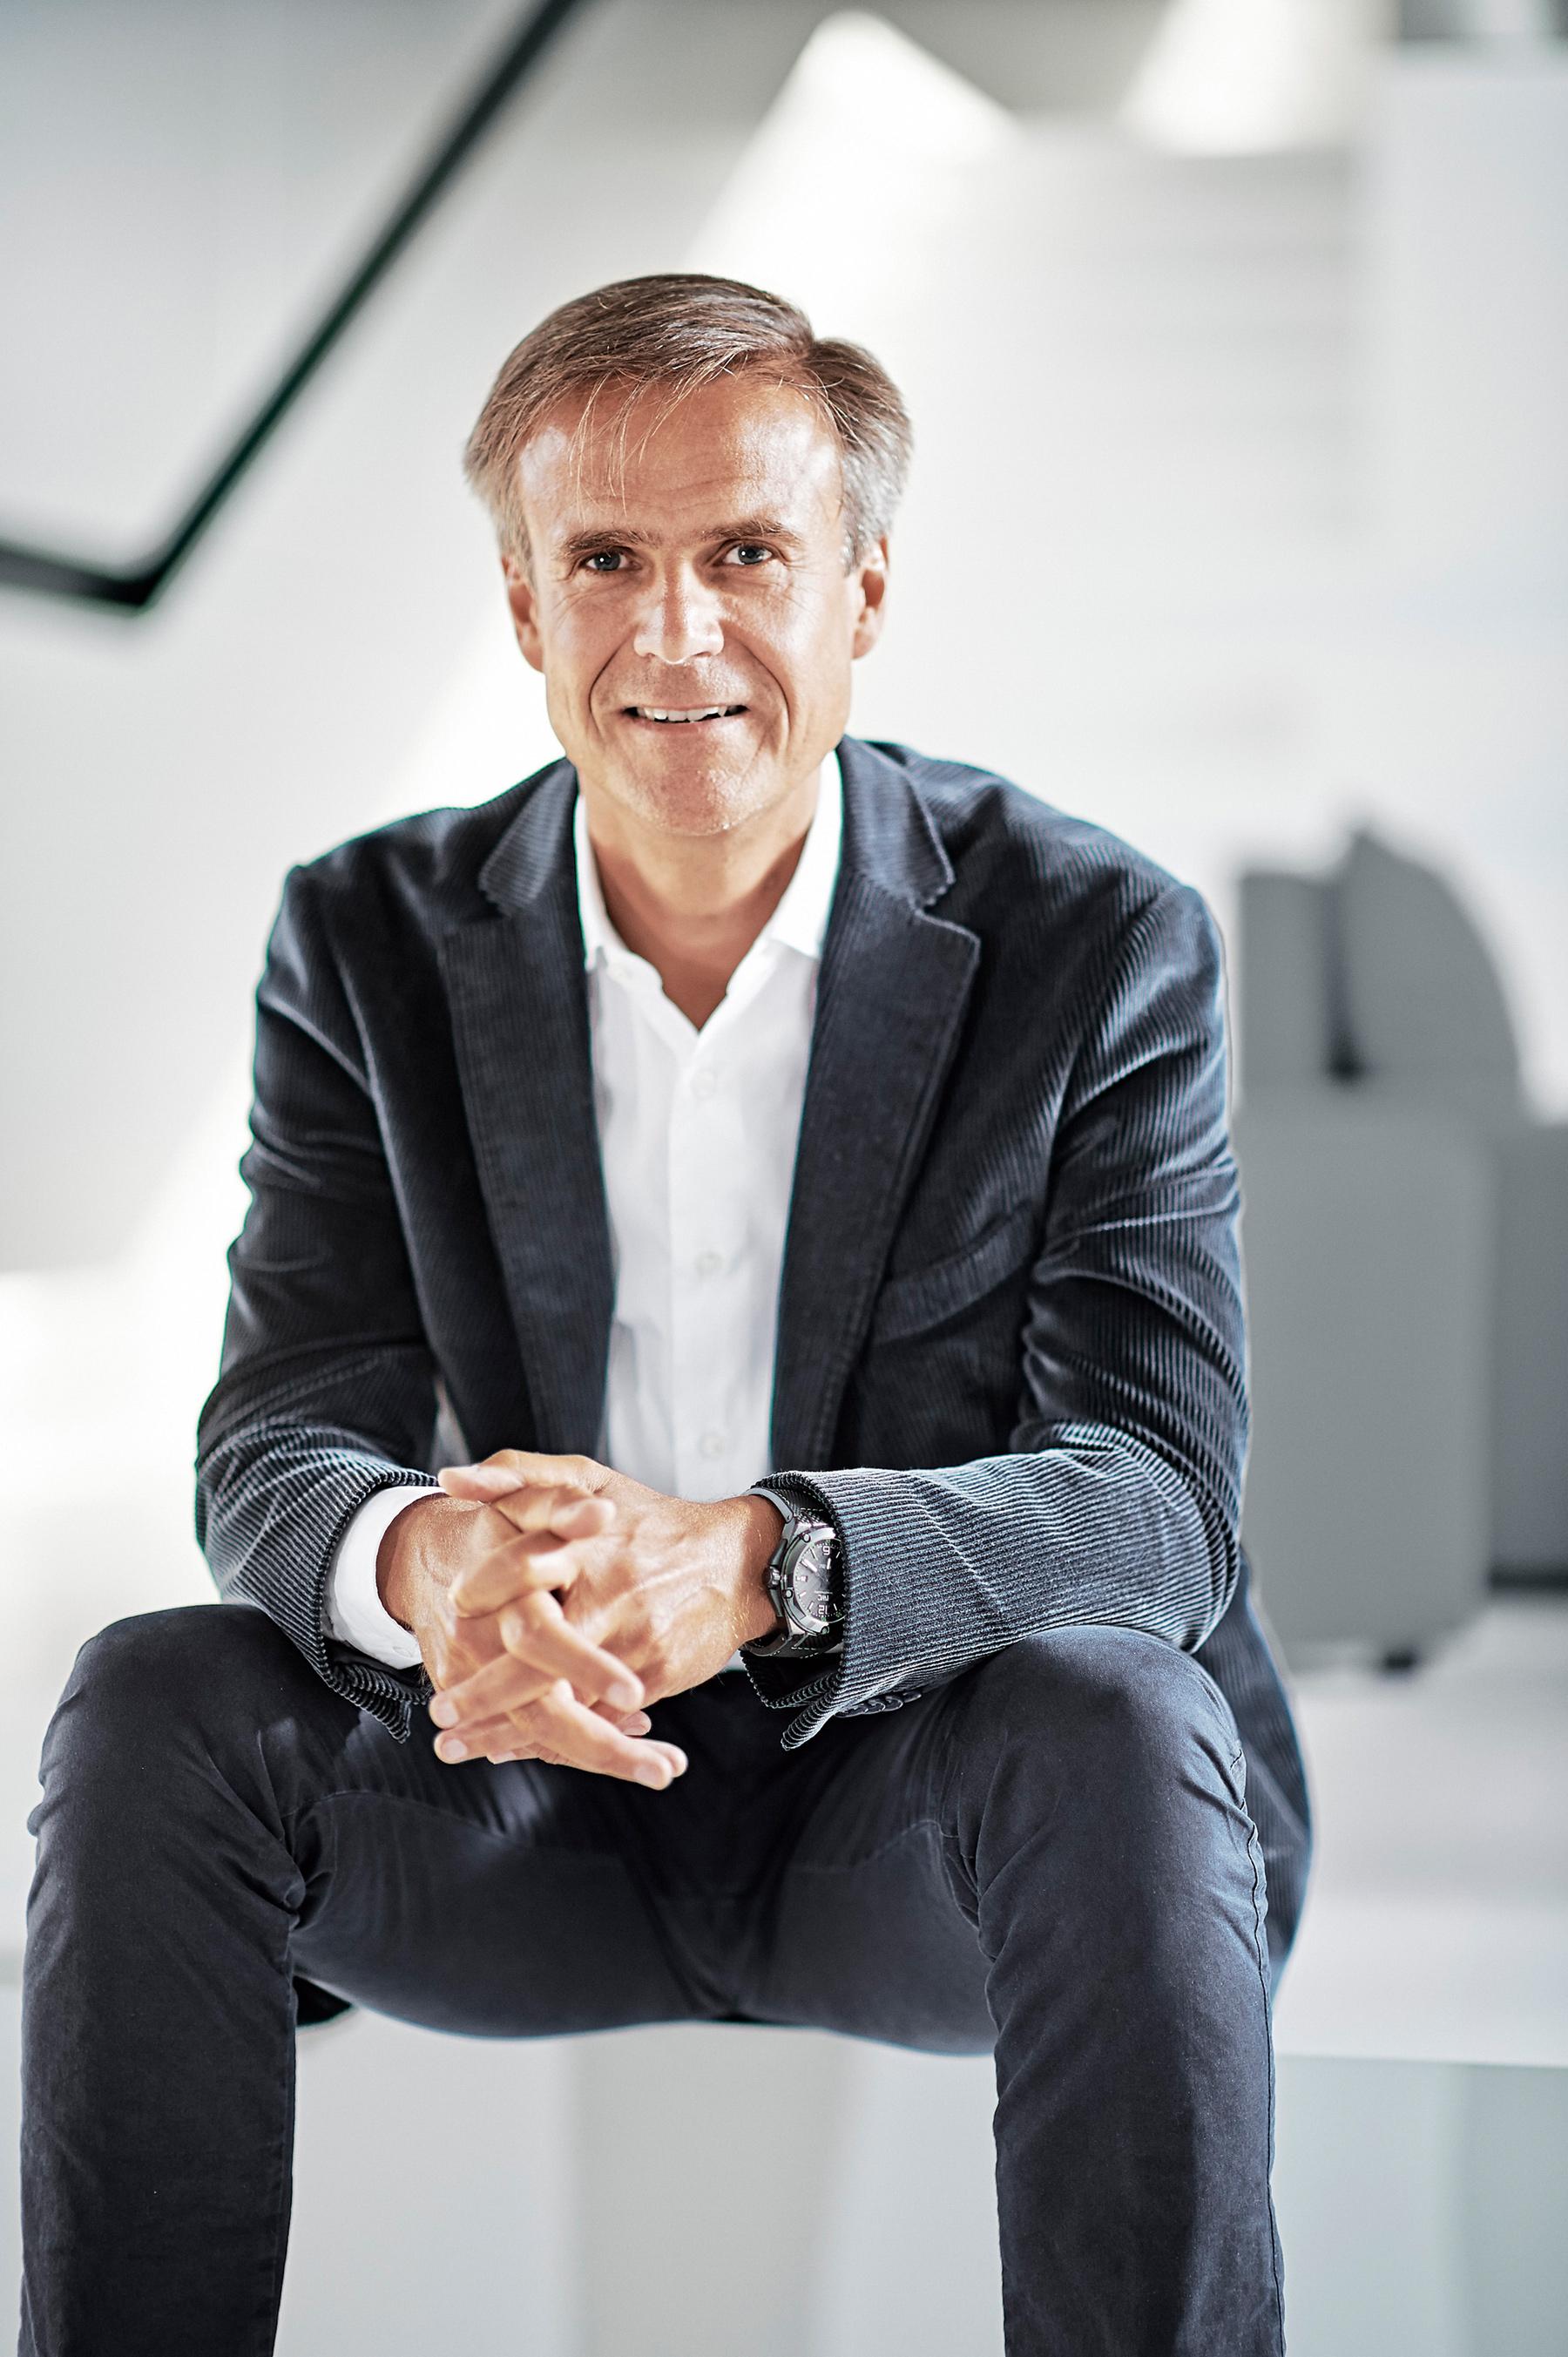 Michael Mauer, head of Porsche's design department